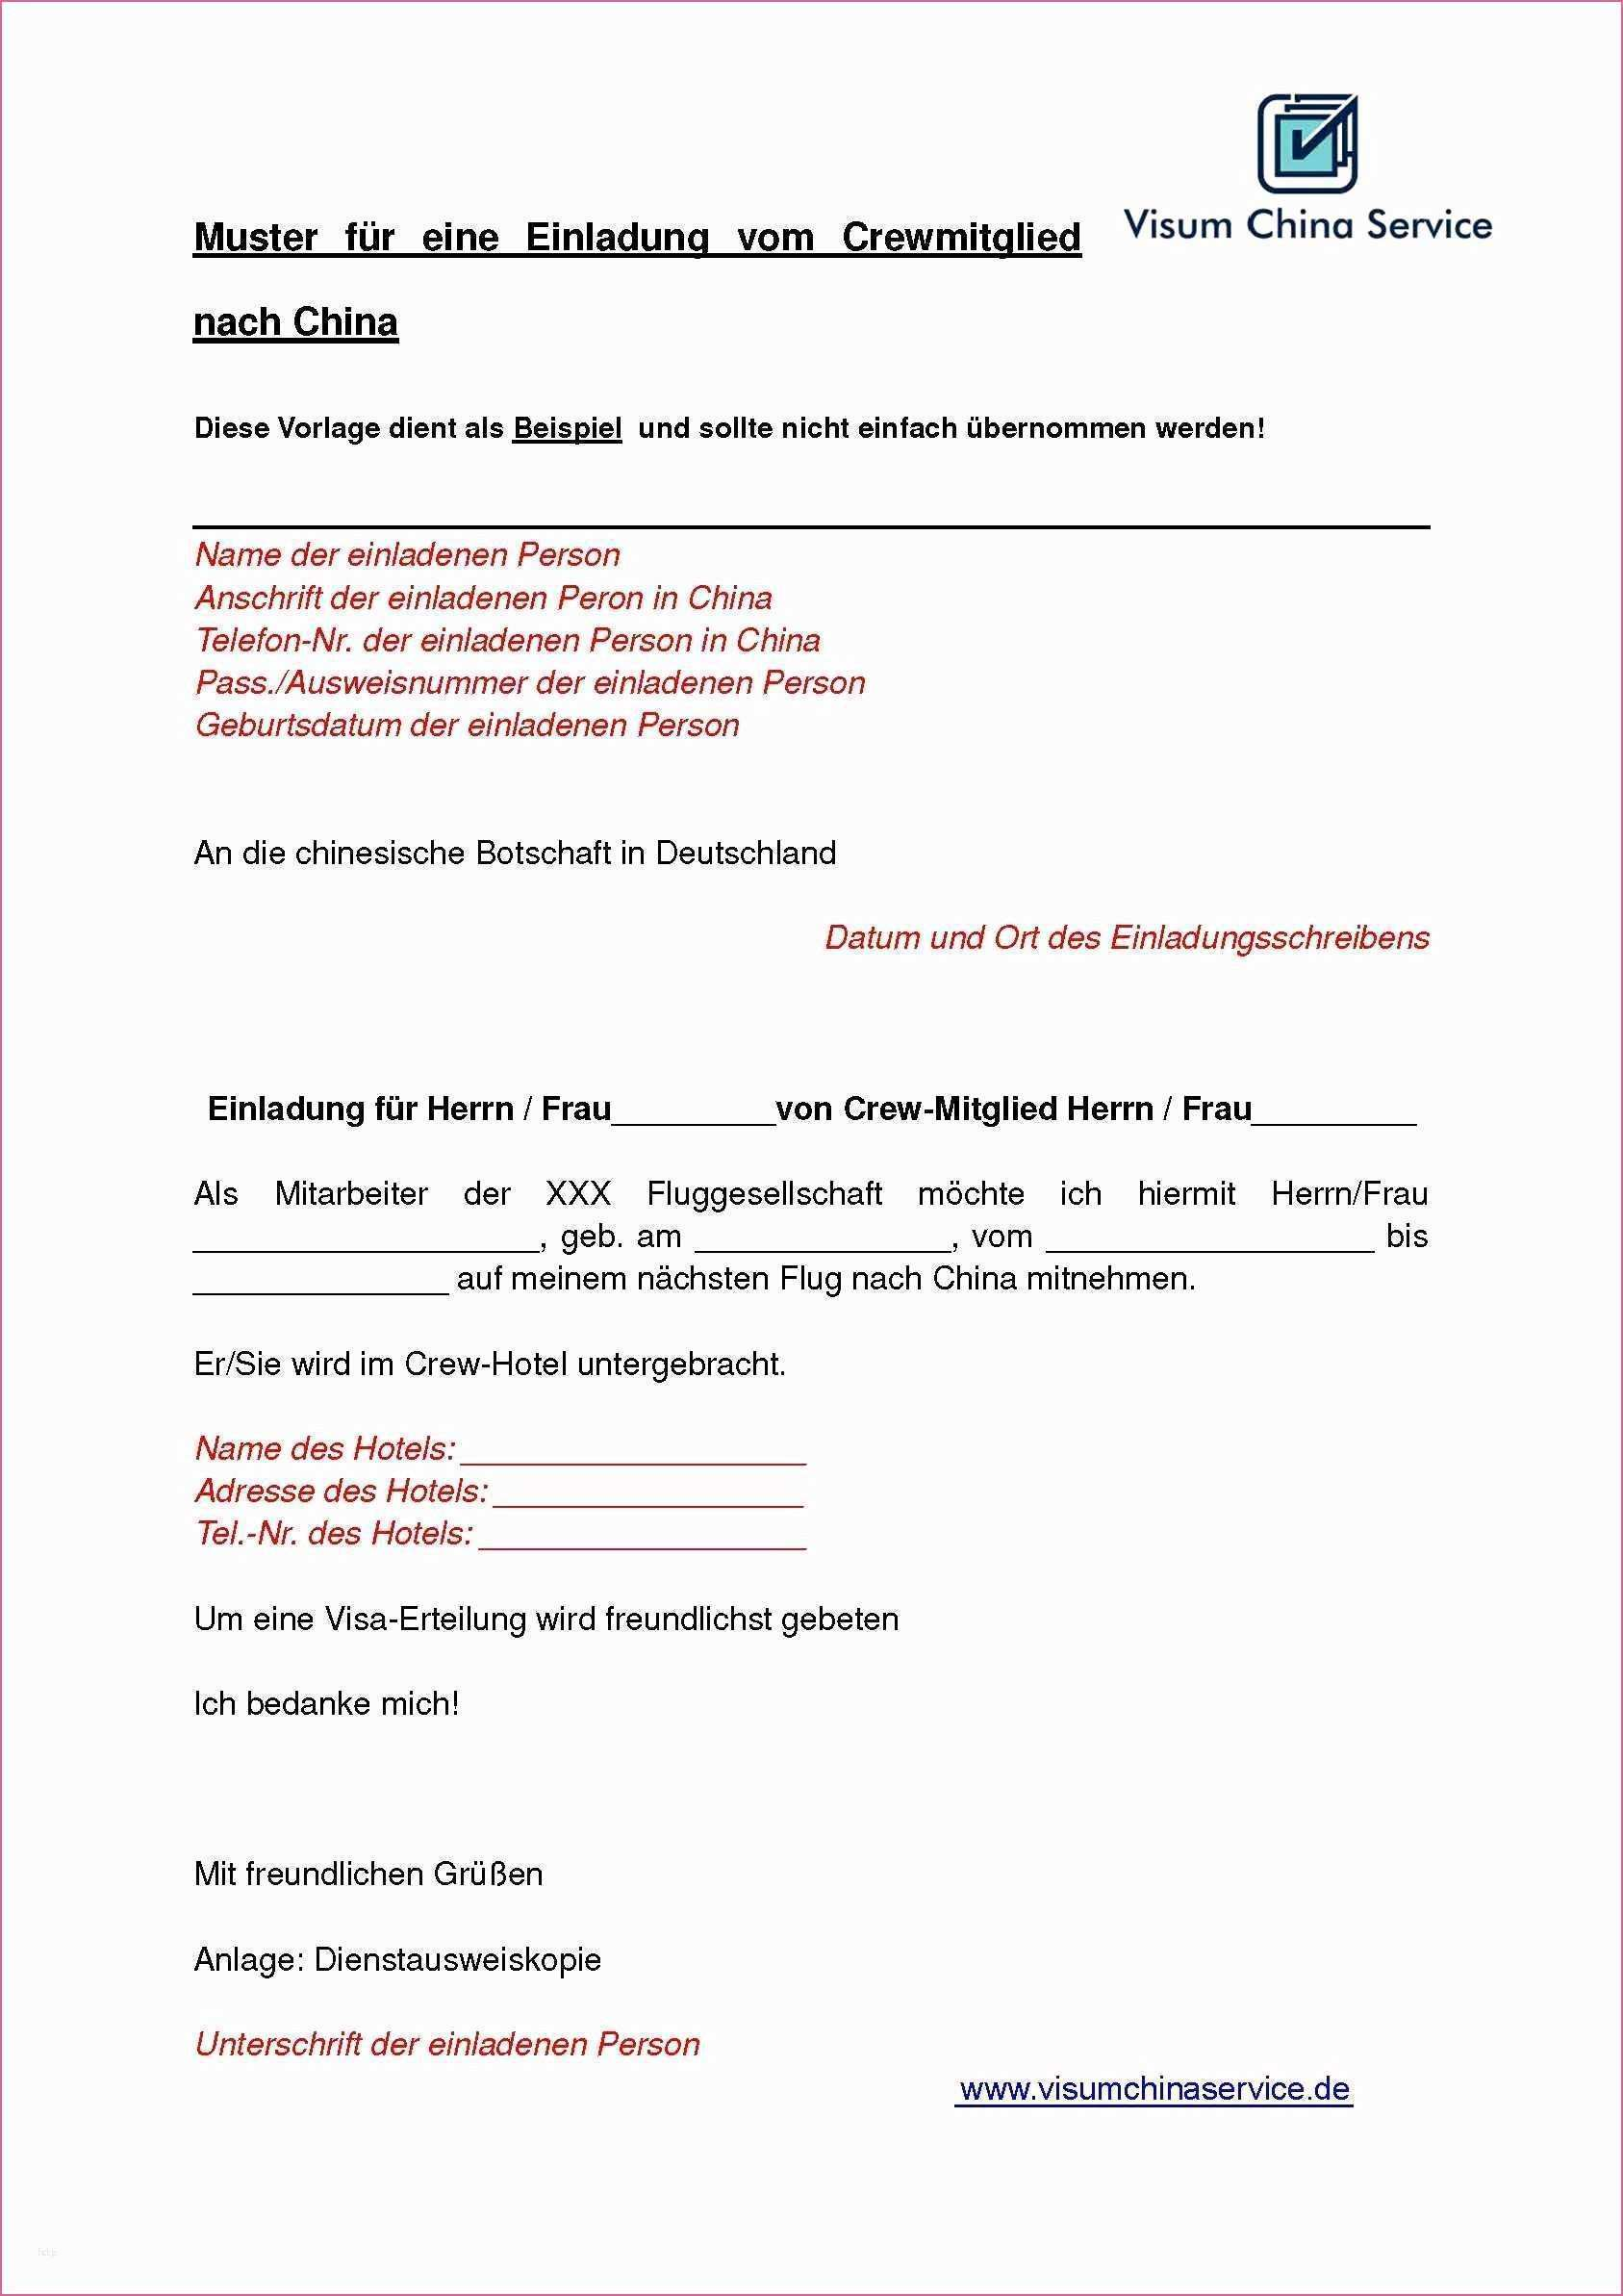 Einladungsschreiben Visum Muster Privat Einladungsschreiben Visum Muster Privat Einladungsschreiben Visum Christmas Party Invitations Invitations Lettering